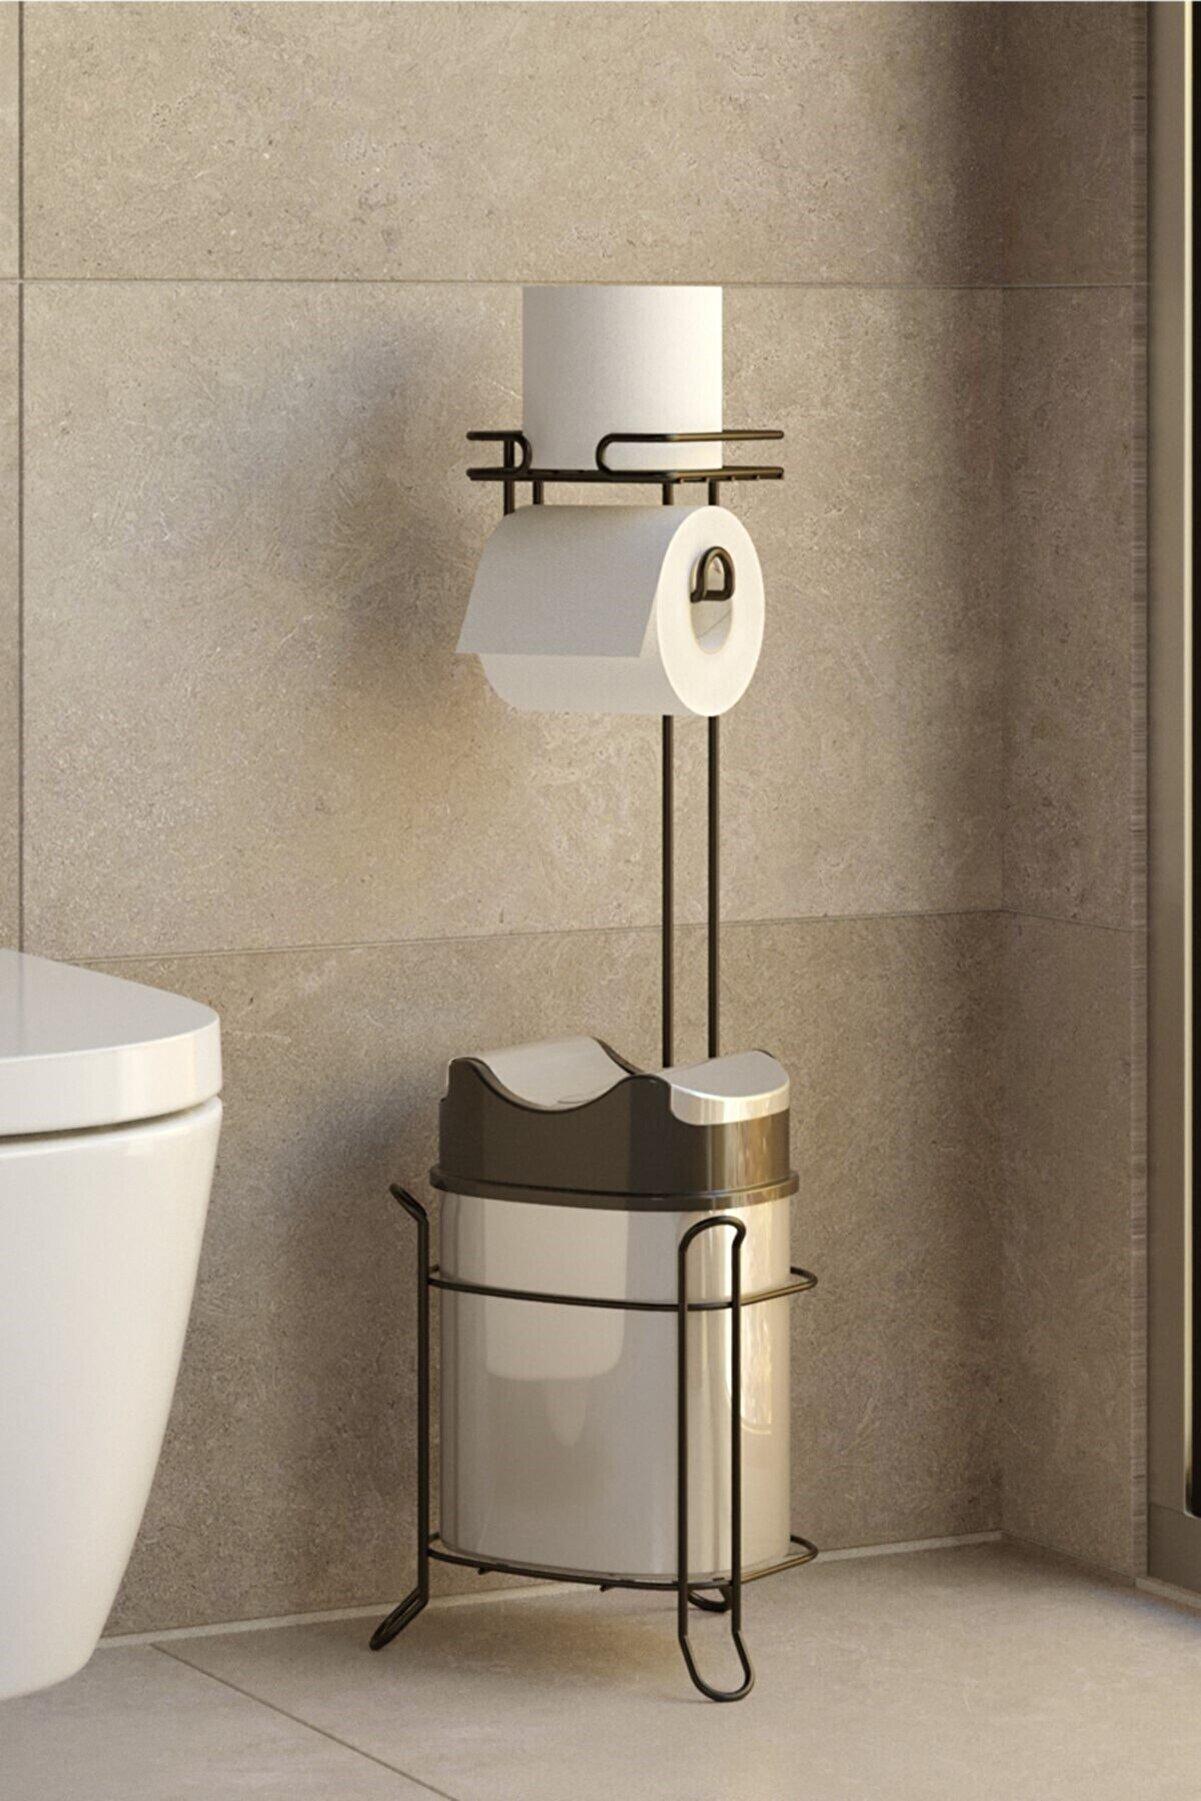 Teknotel Yutan Kapak Çöp Kovası ve Tuvalet Kağıtlık Mg098